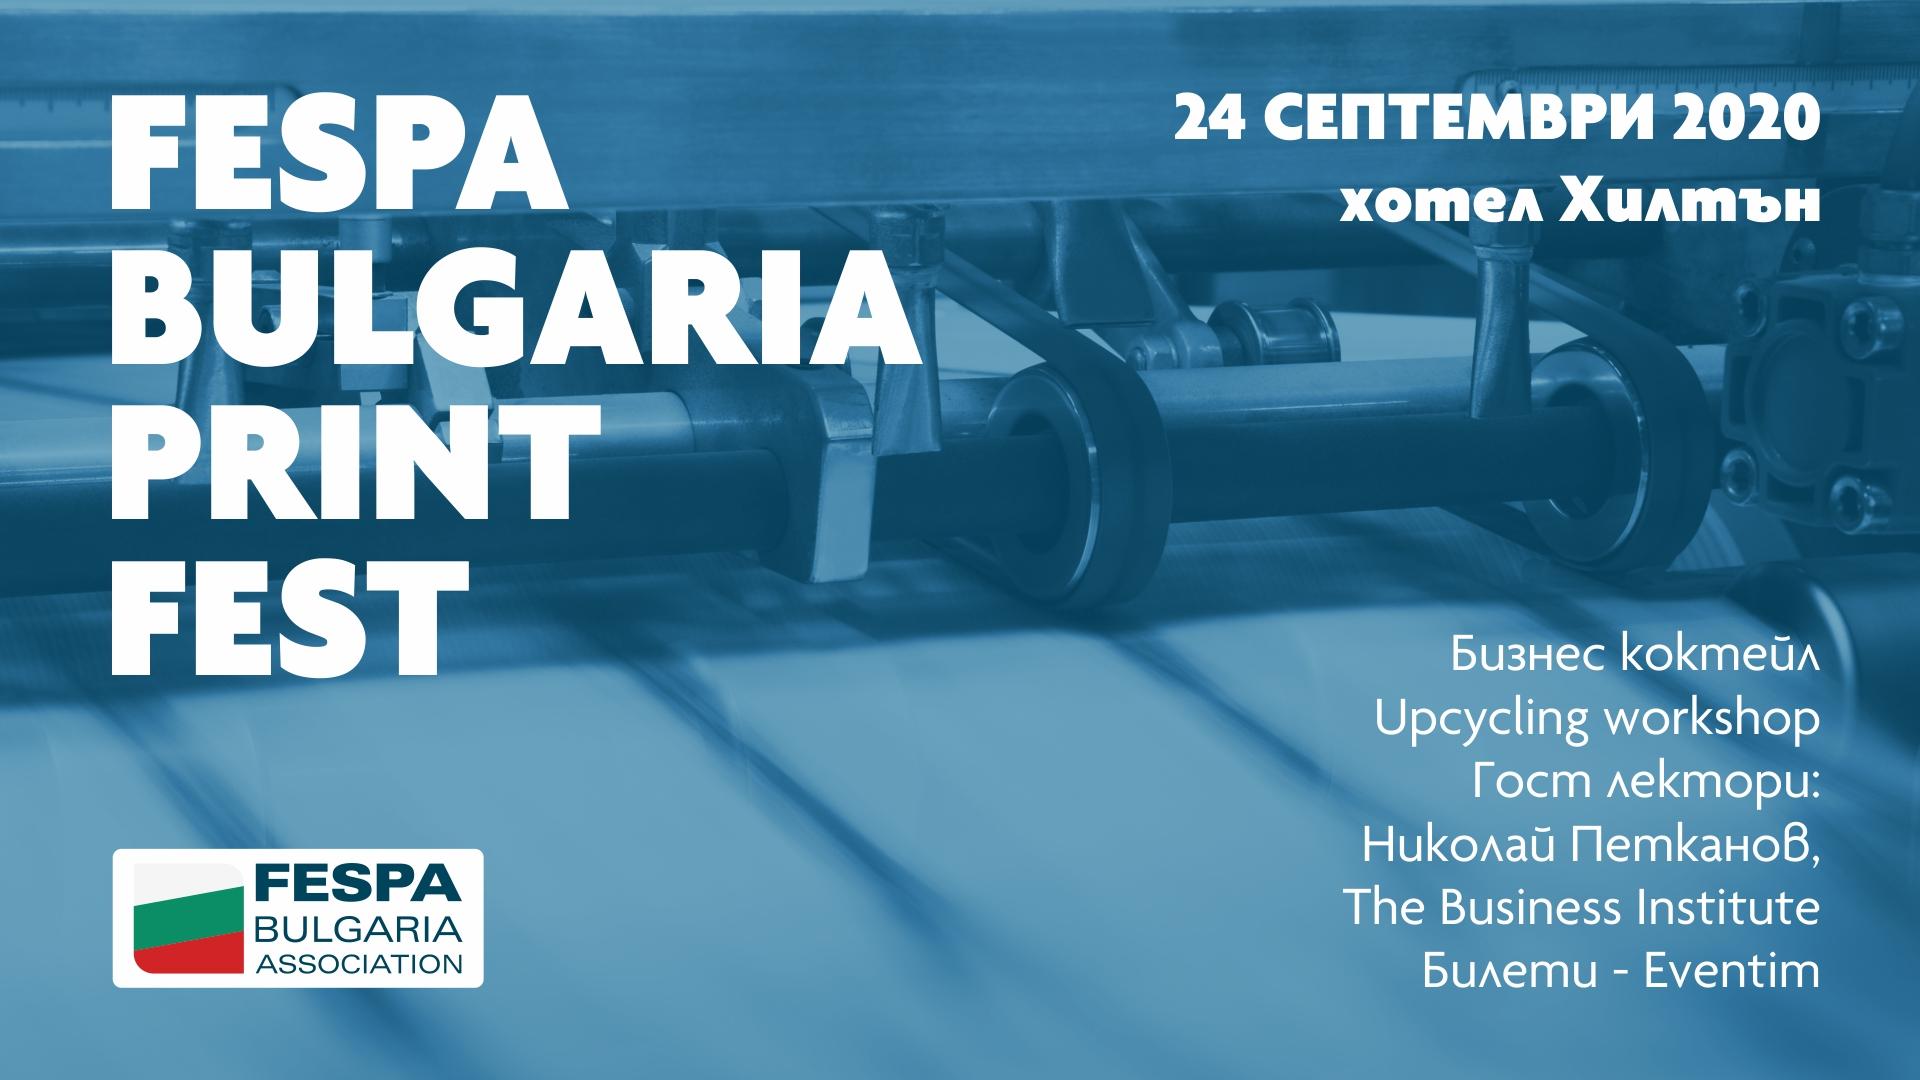 Fespa Bulgaria Print Fest